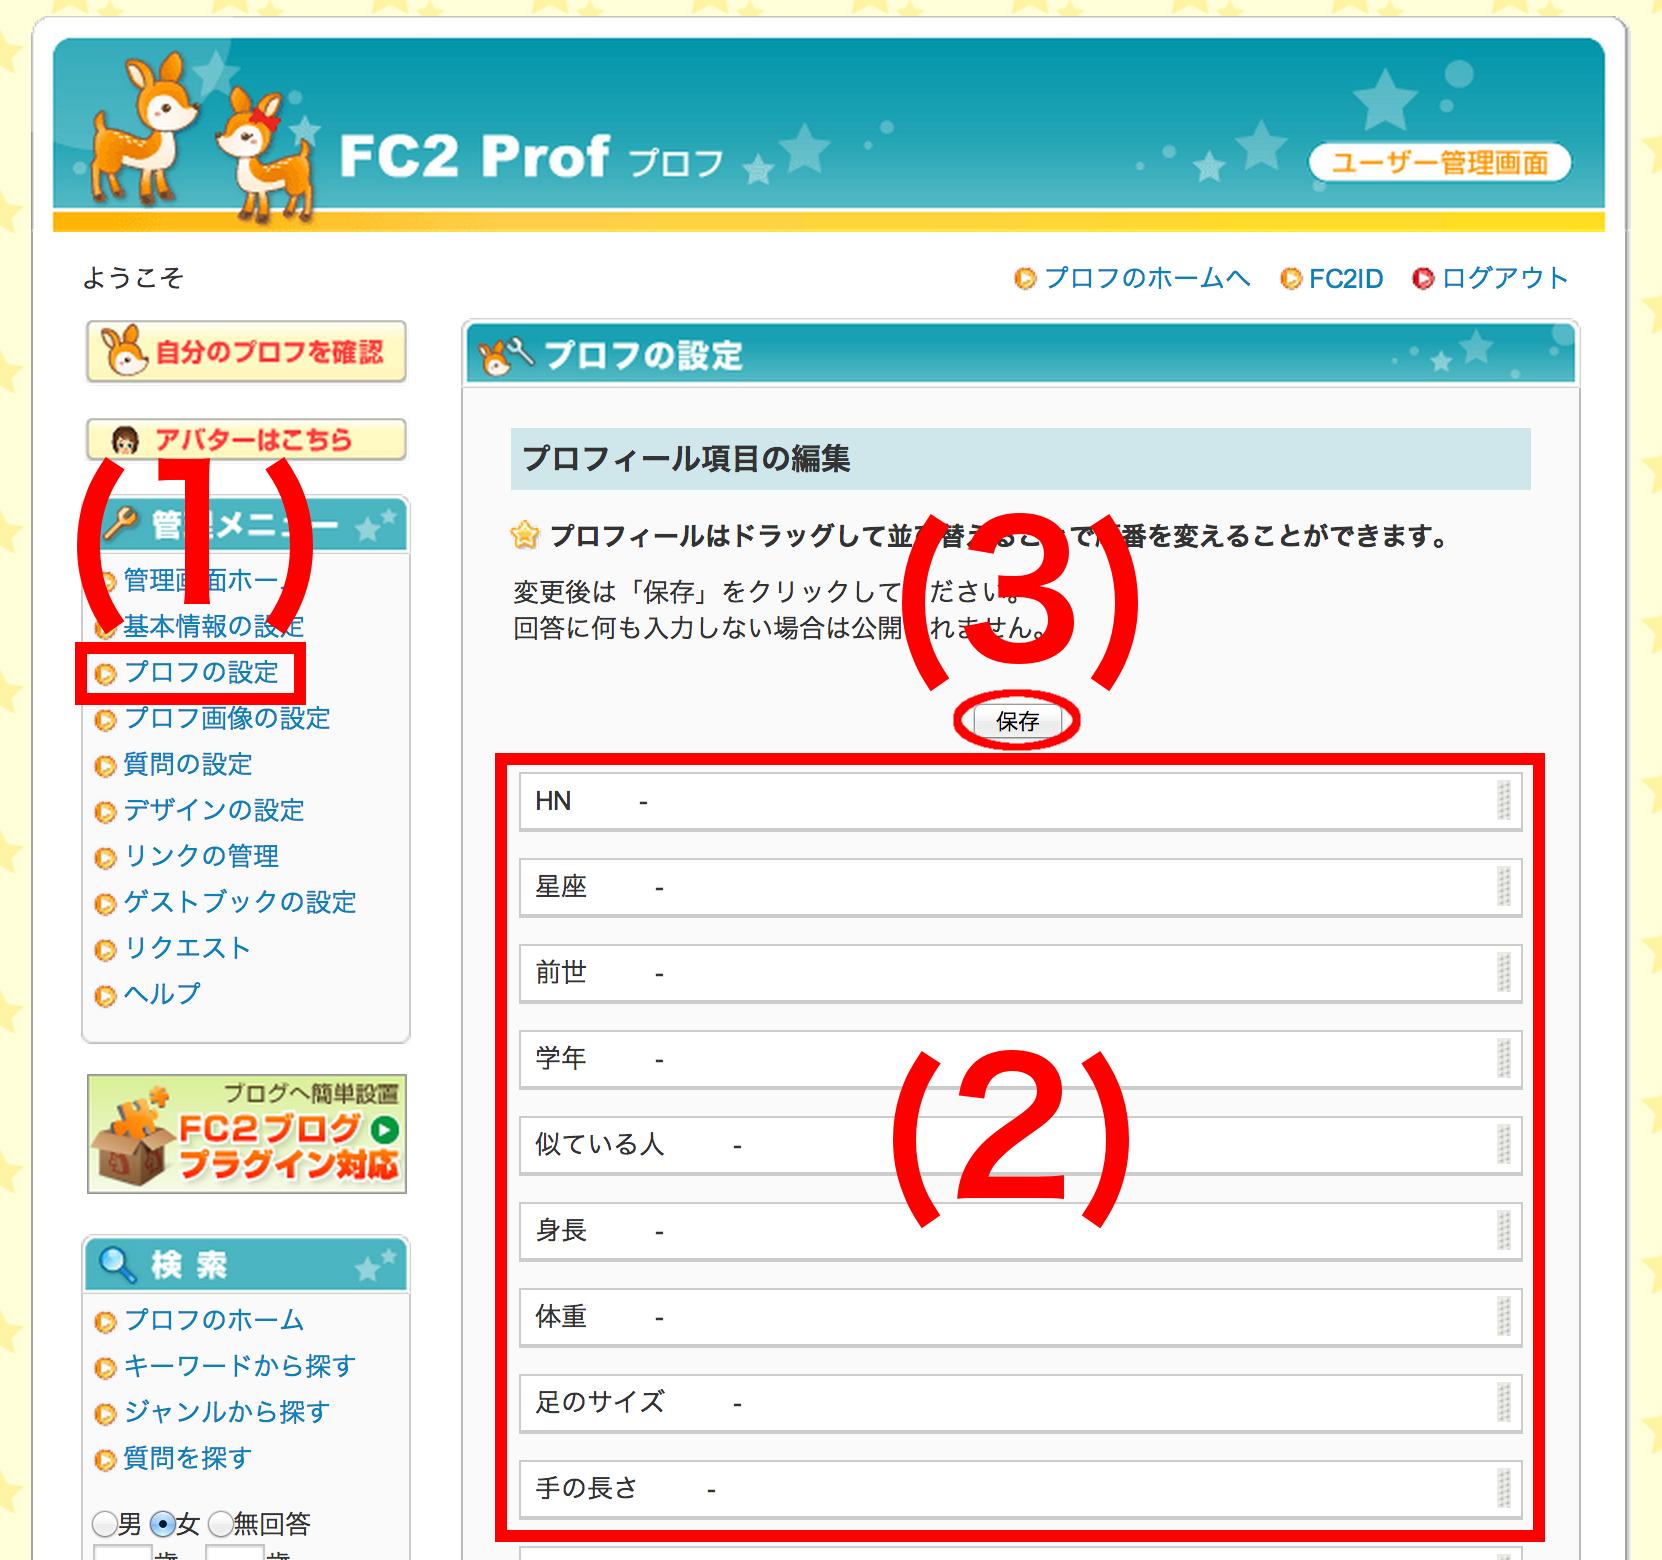 FC2prof_3.jpg